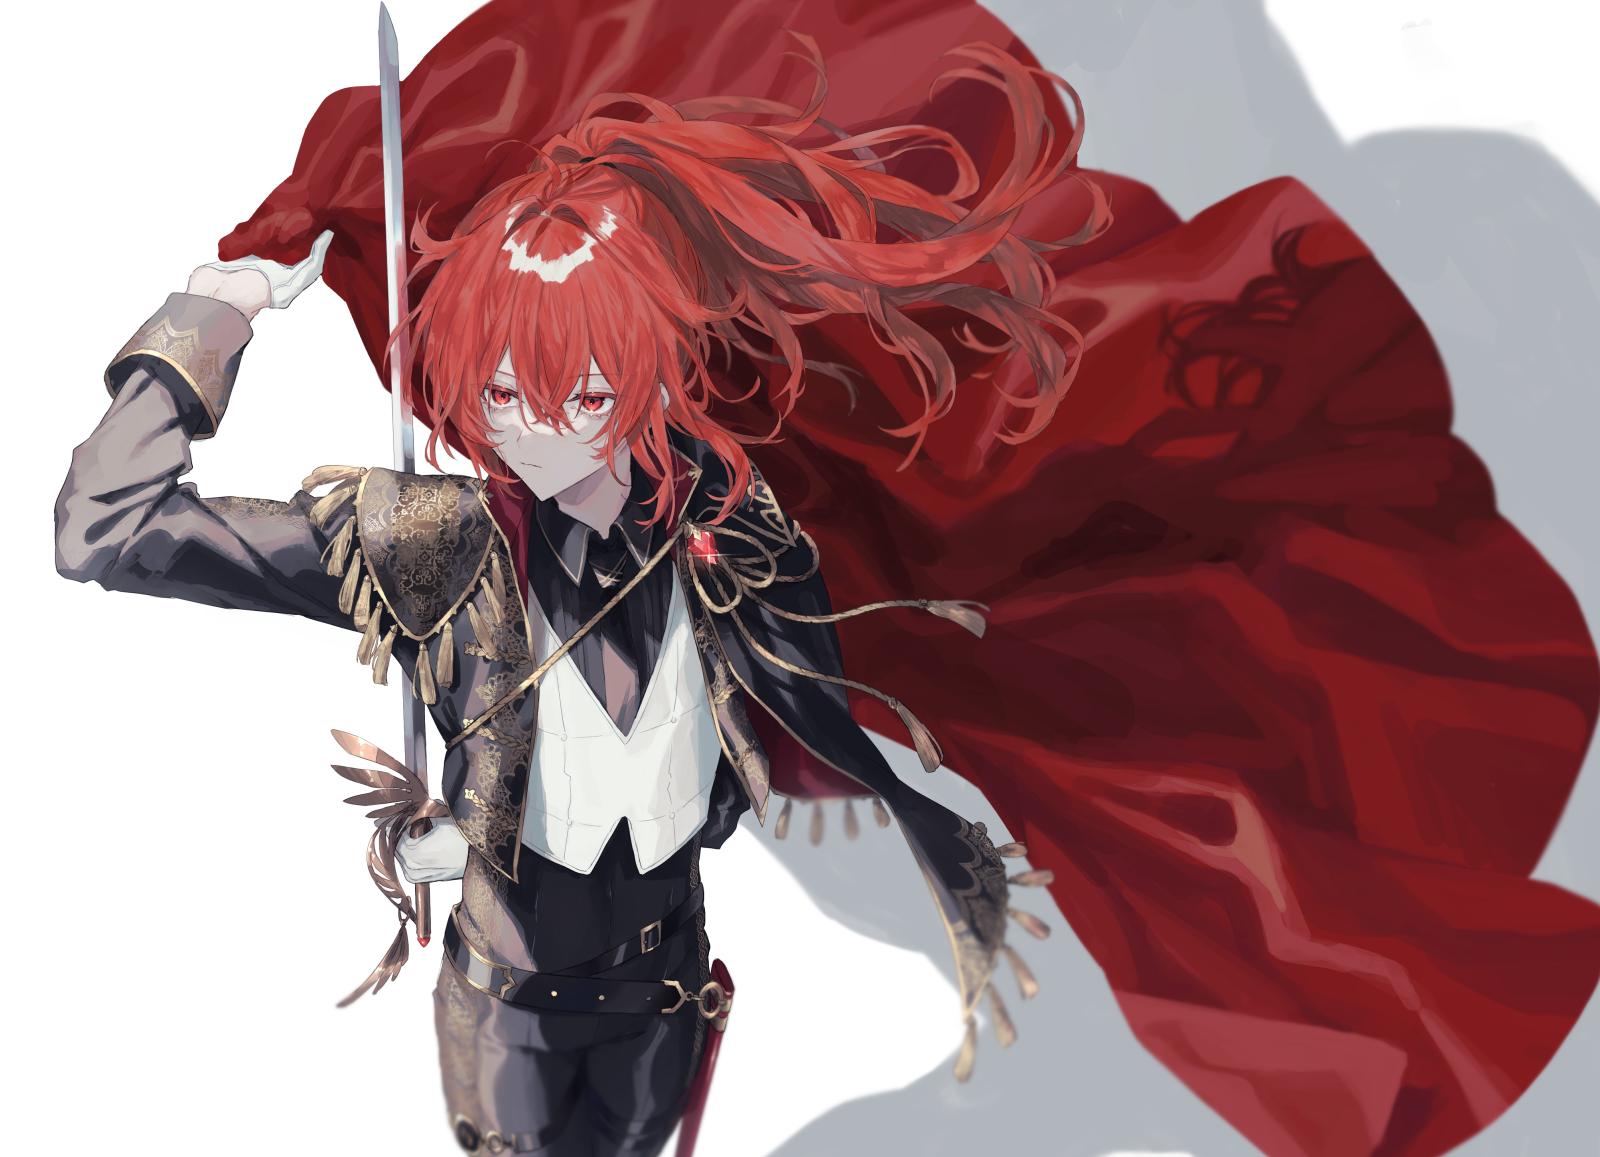 Anime 1600x1157 Genshin Impact Diluc (Genshin Impact) anime Pixiv redhead red eyes